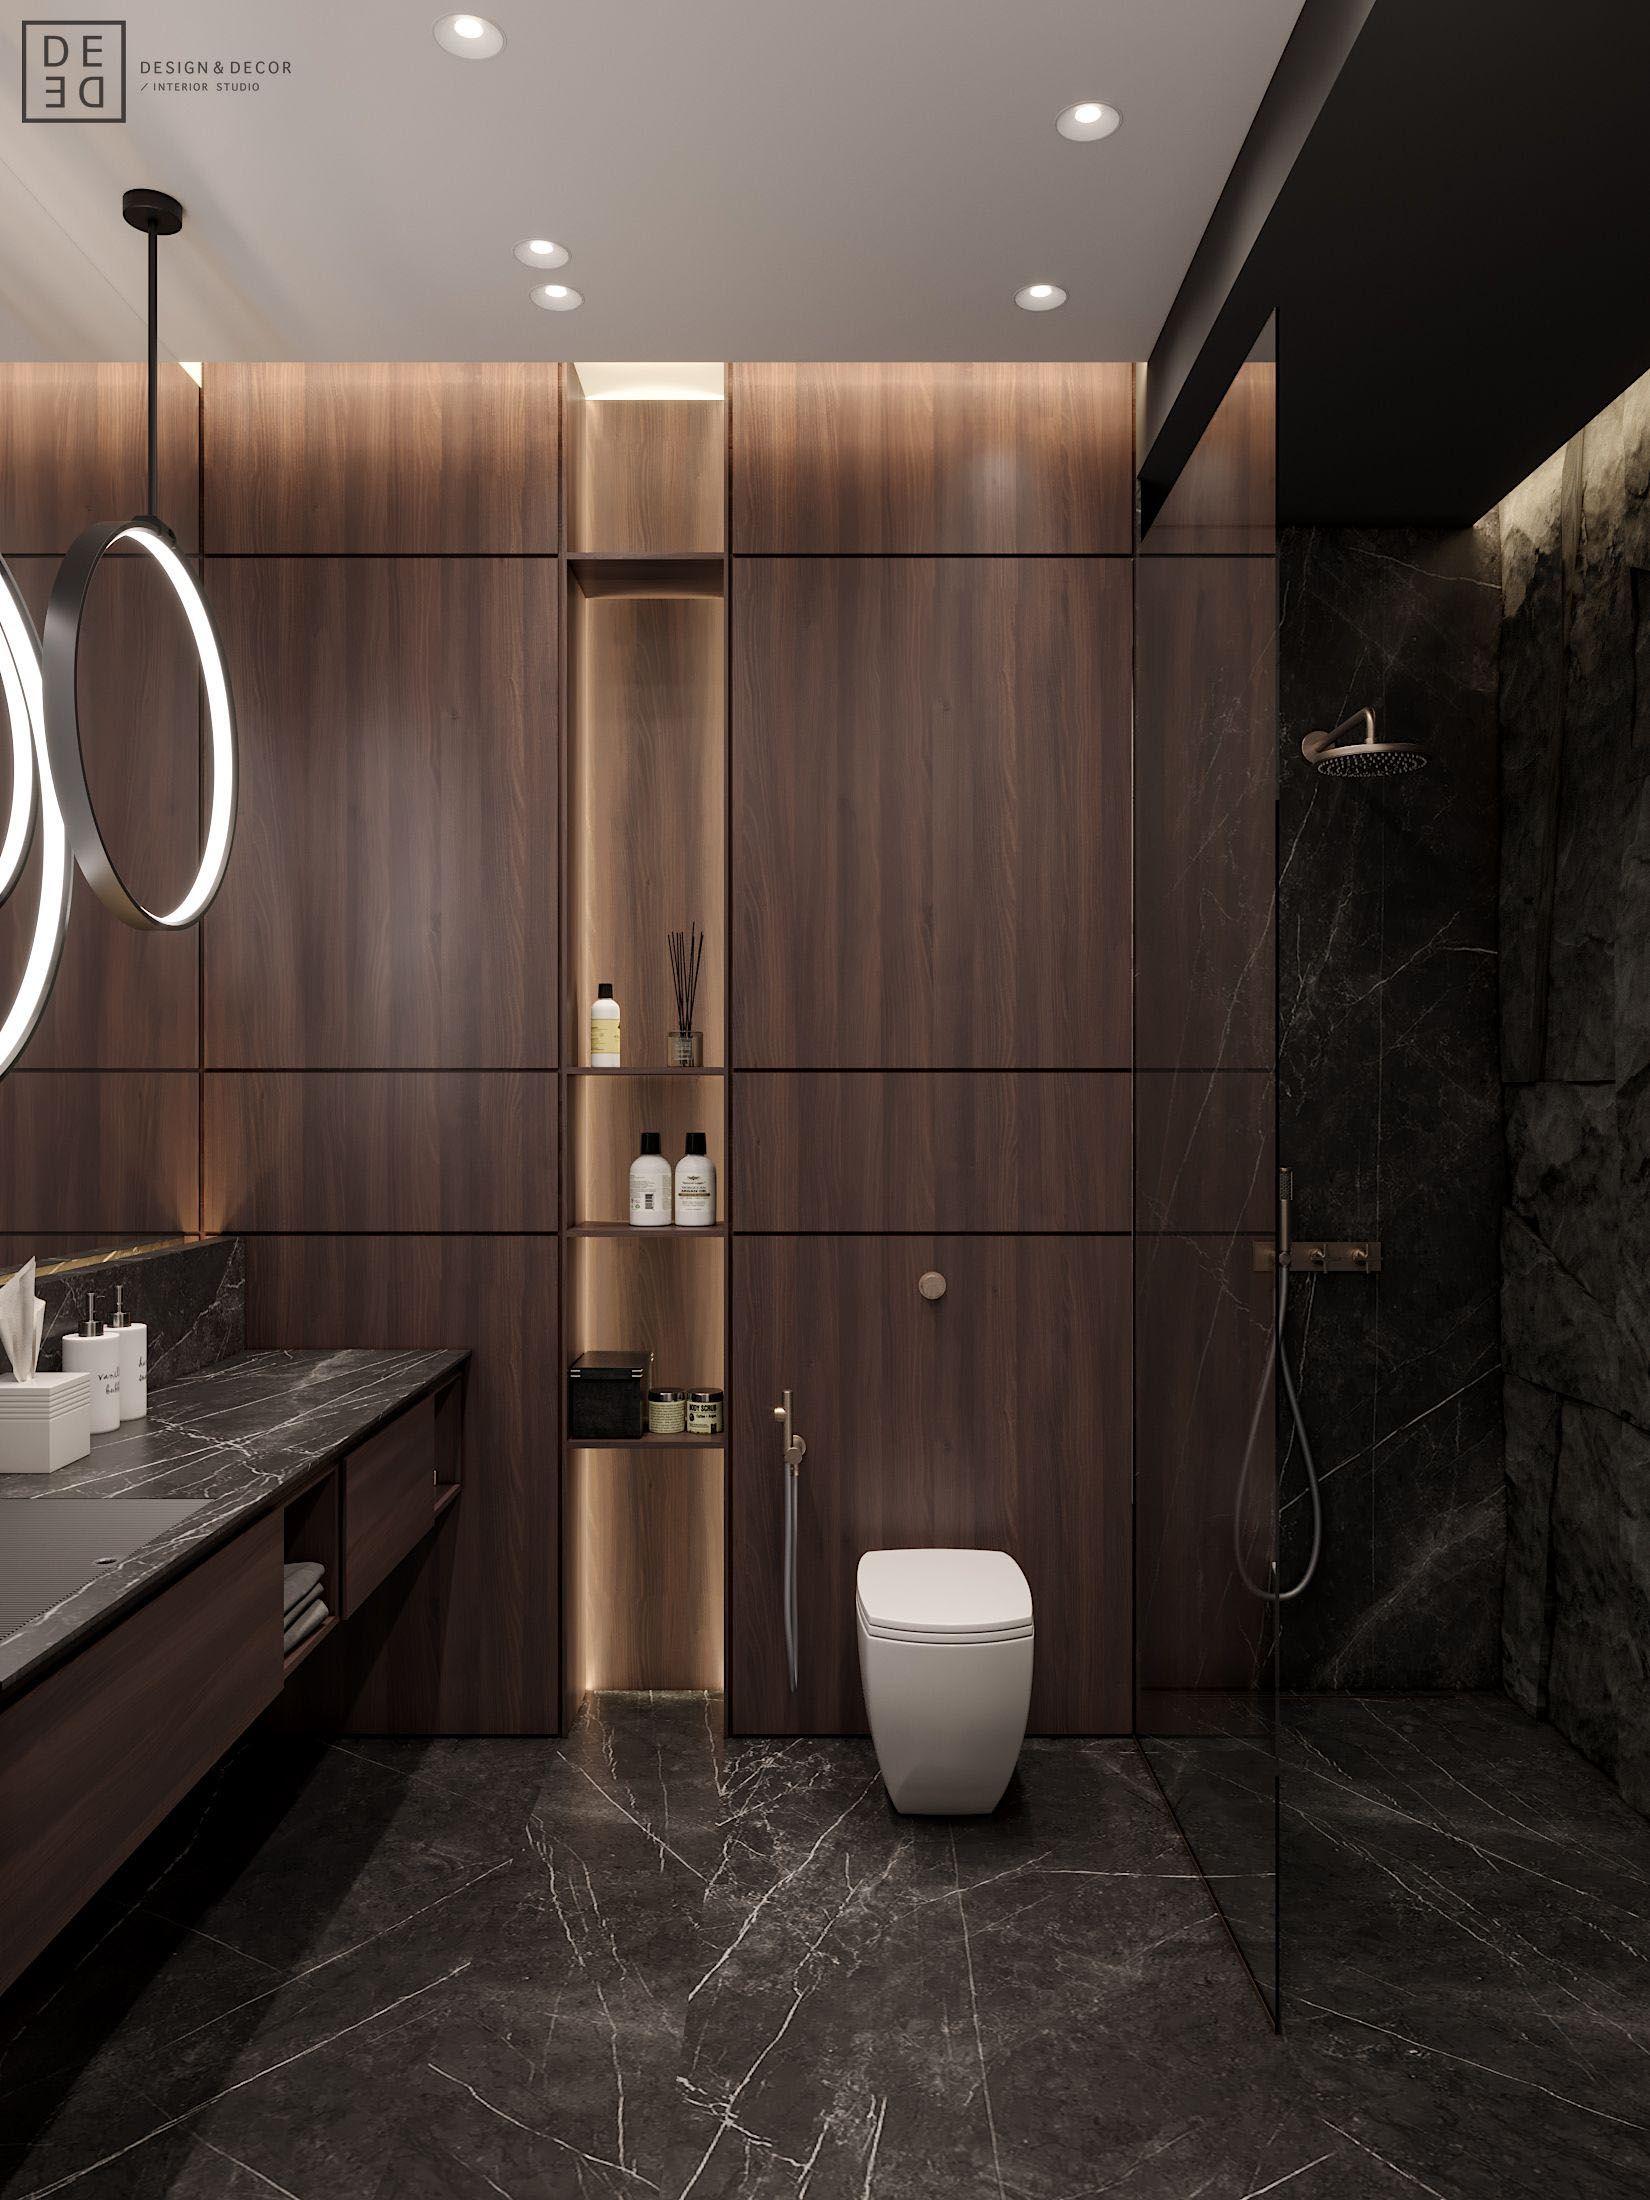 Bathroom Accessories Ideas Decor Inspiration